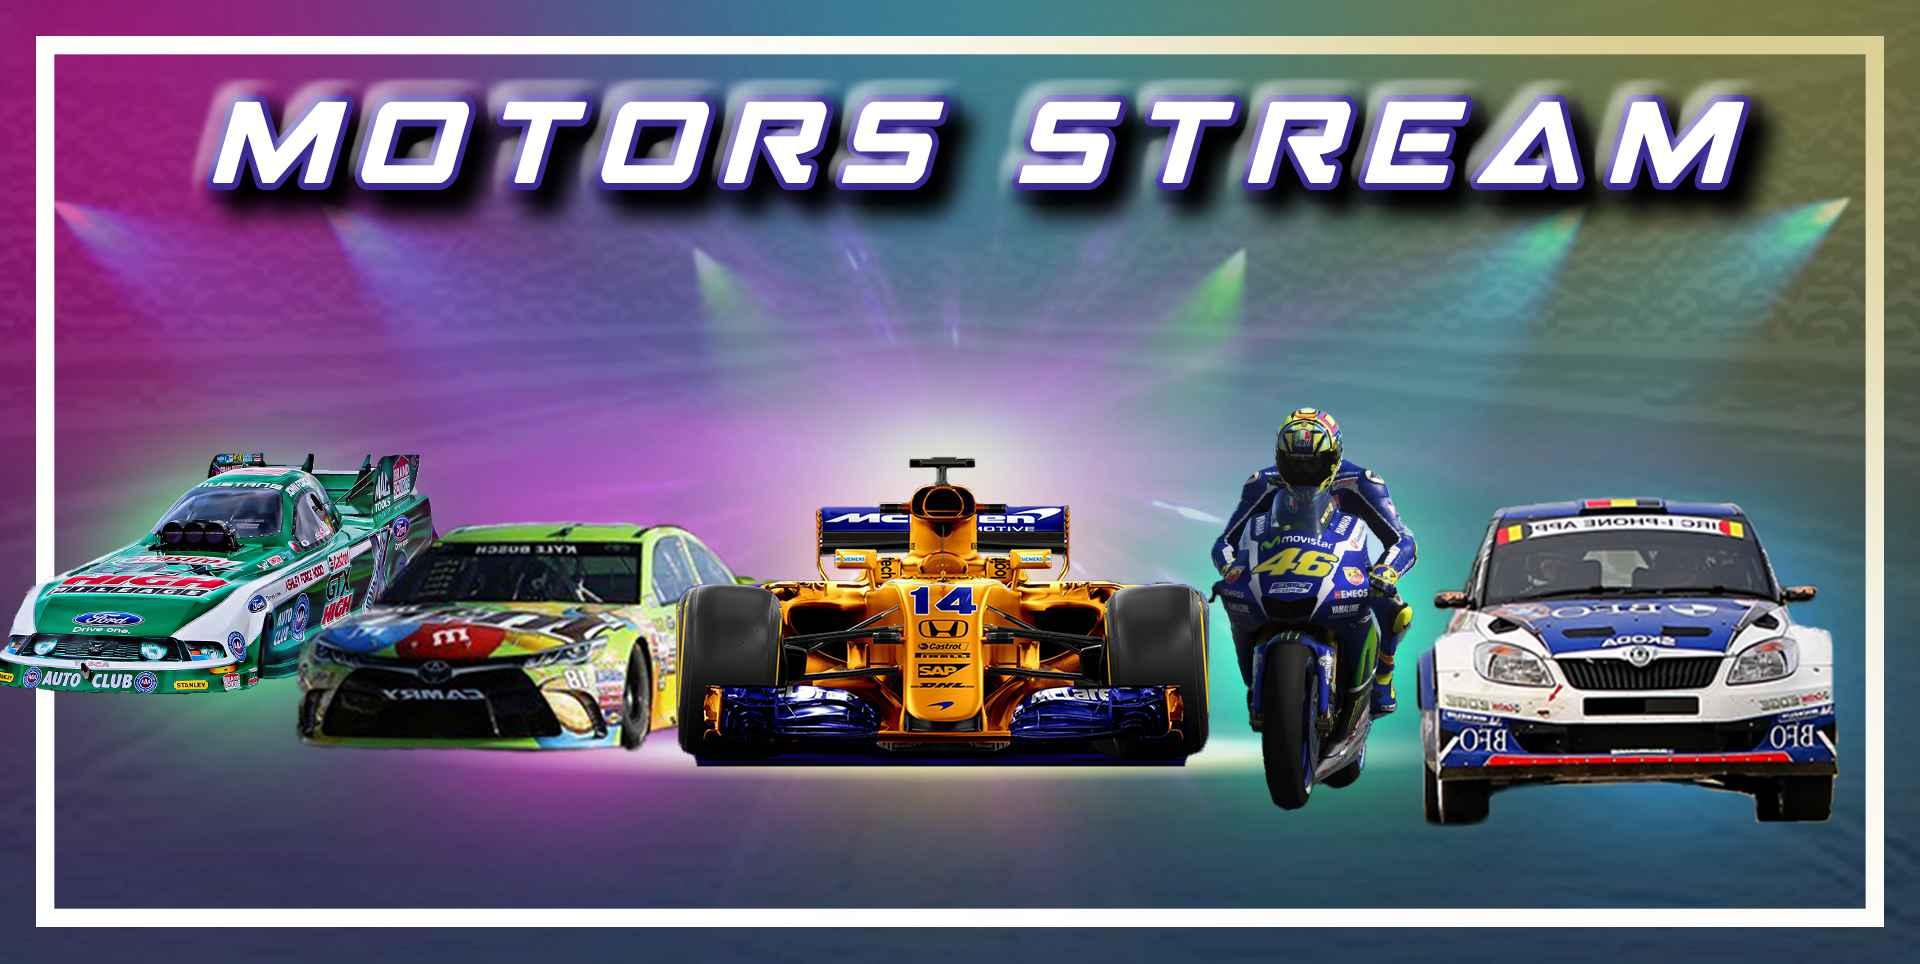 Motor Sports Stream 2018 Live slider